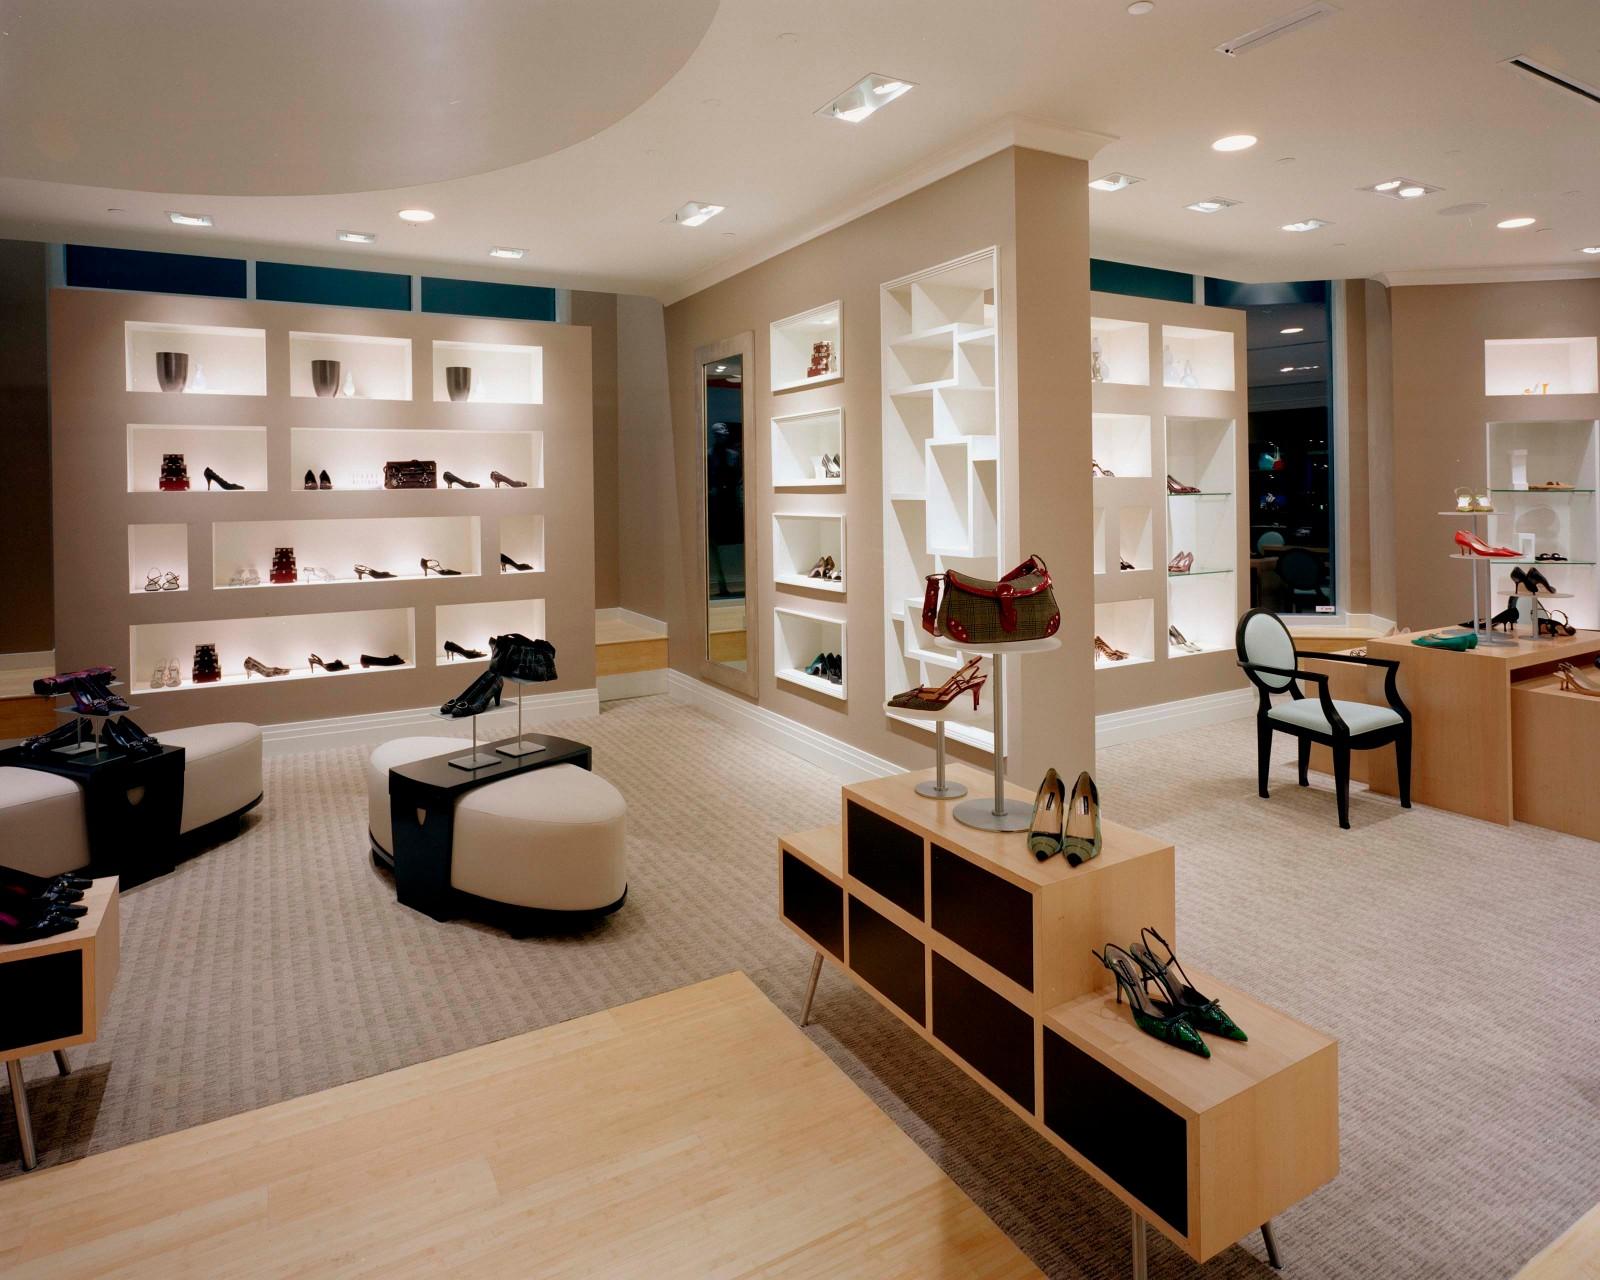 OUYEE chic shoe shop interior design popular for chain shop-5